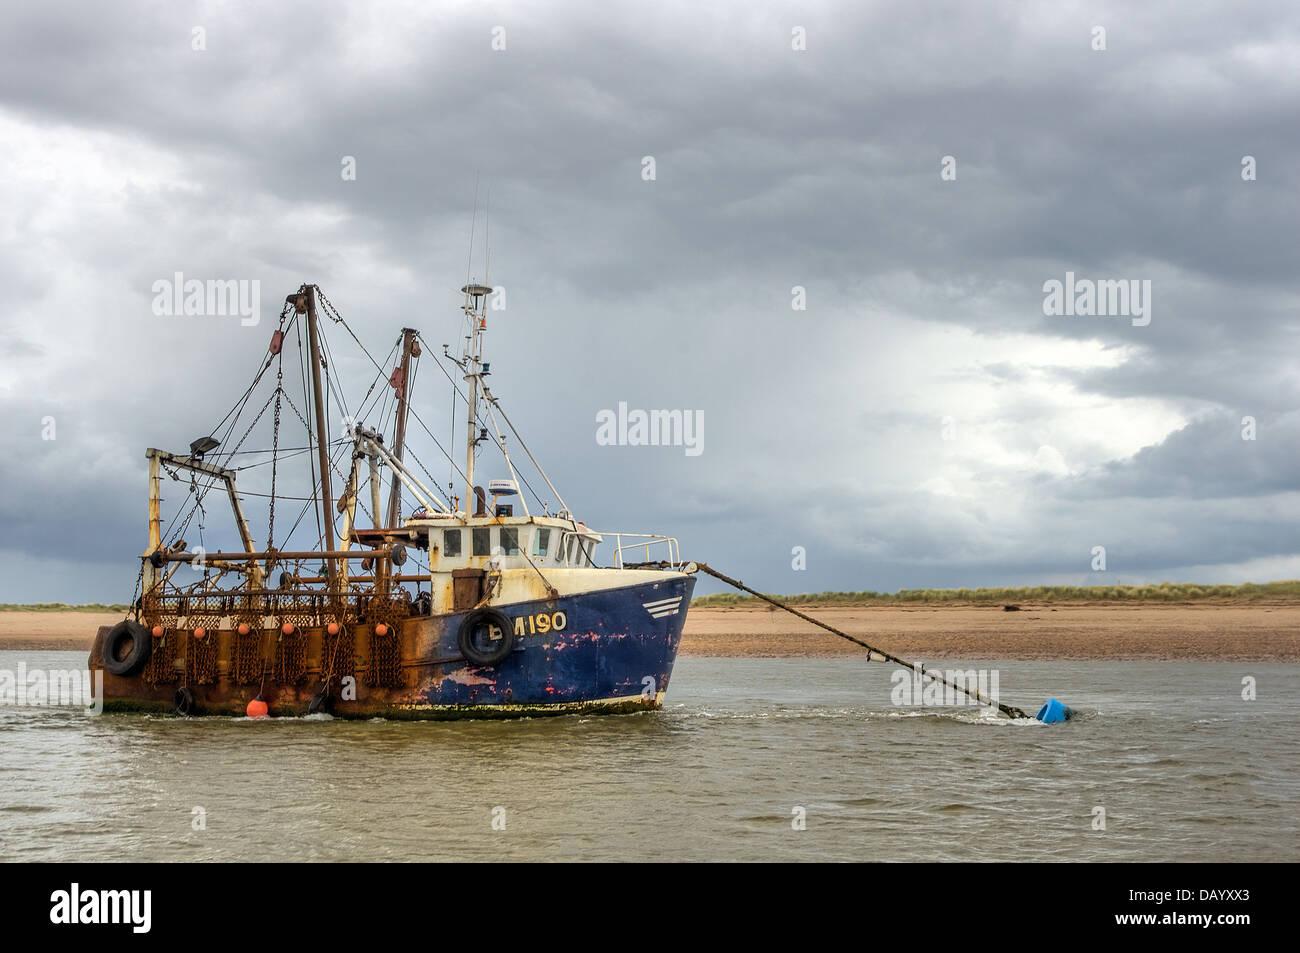 'Marina' (BM190) fishing vessel, alongside the Dawlish Warren sand spit in the Exe Estuary - below a retreating - Stock Image